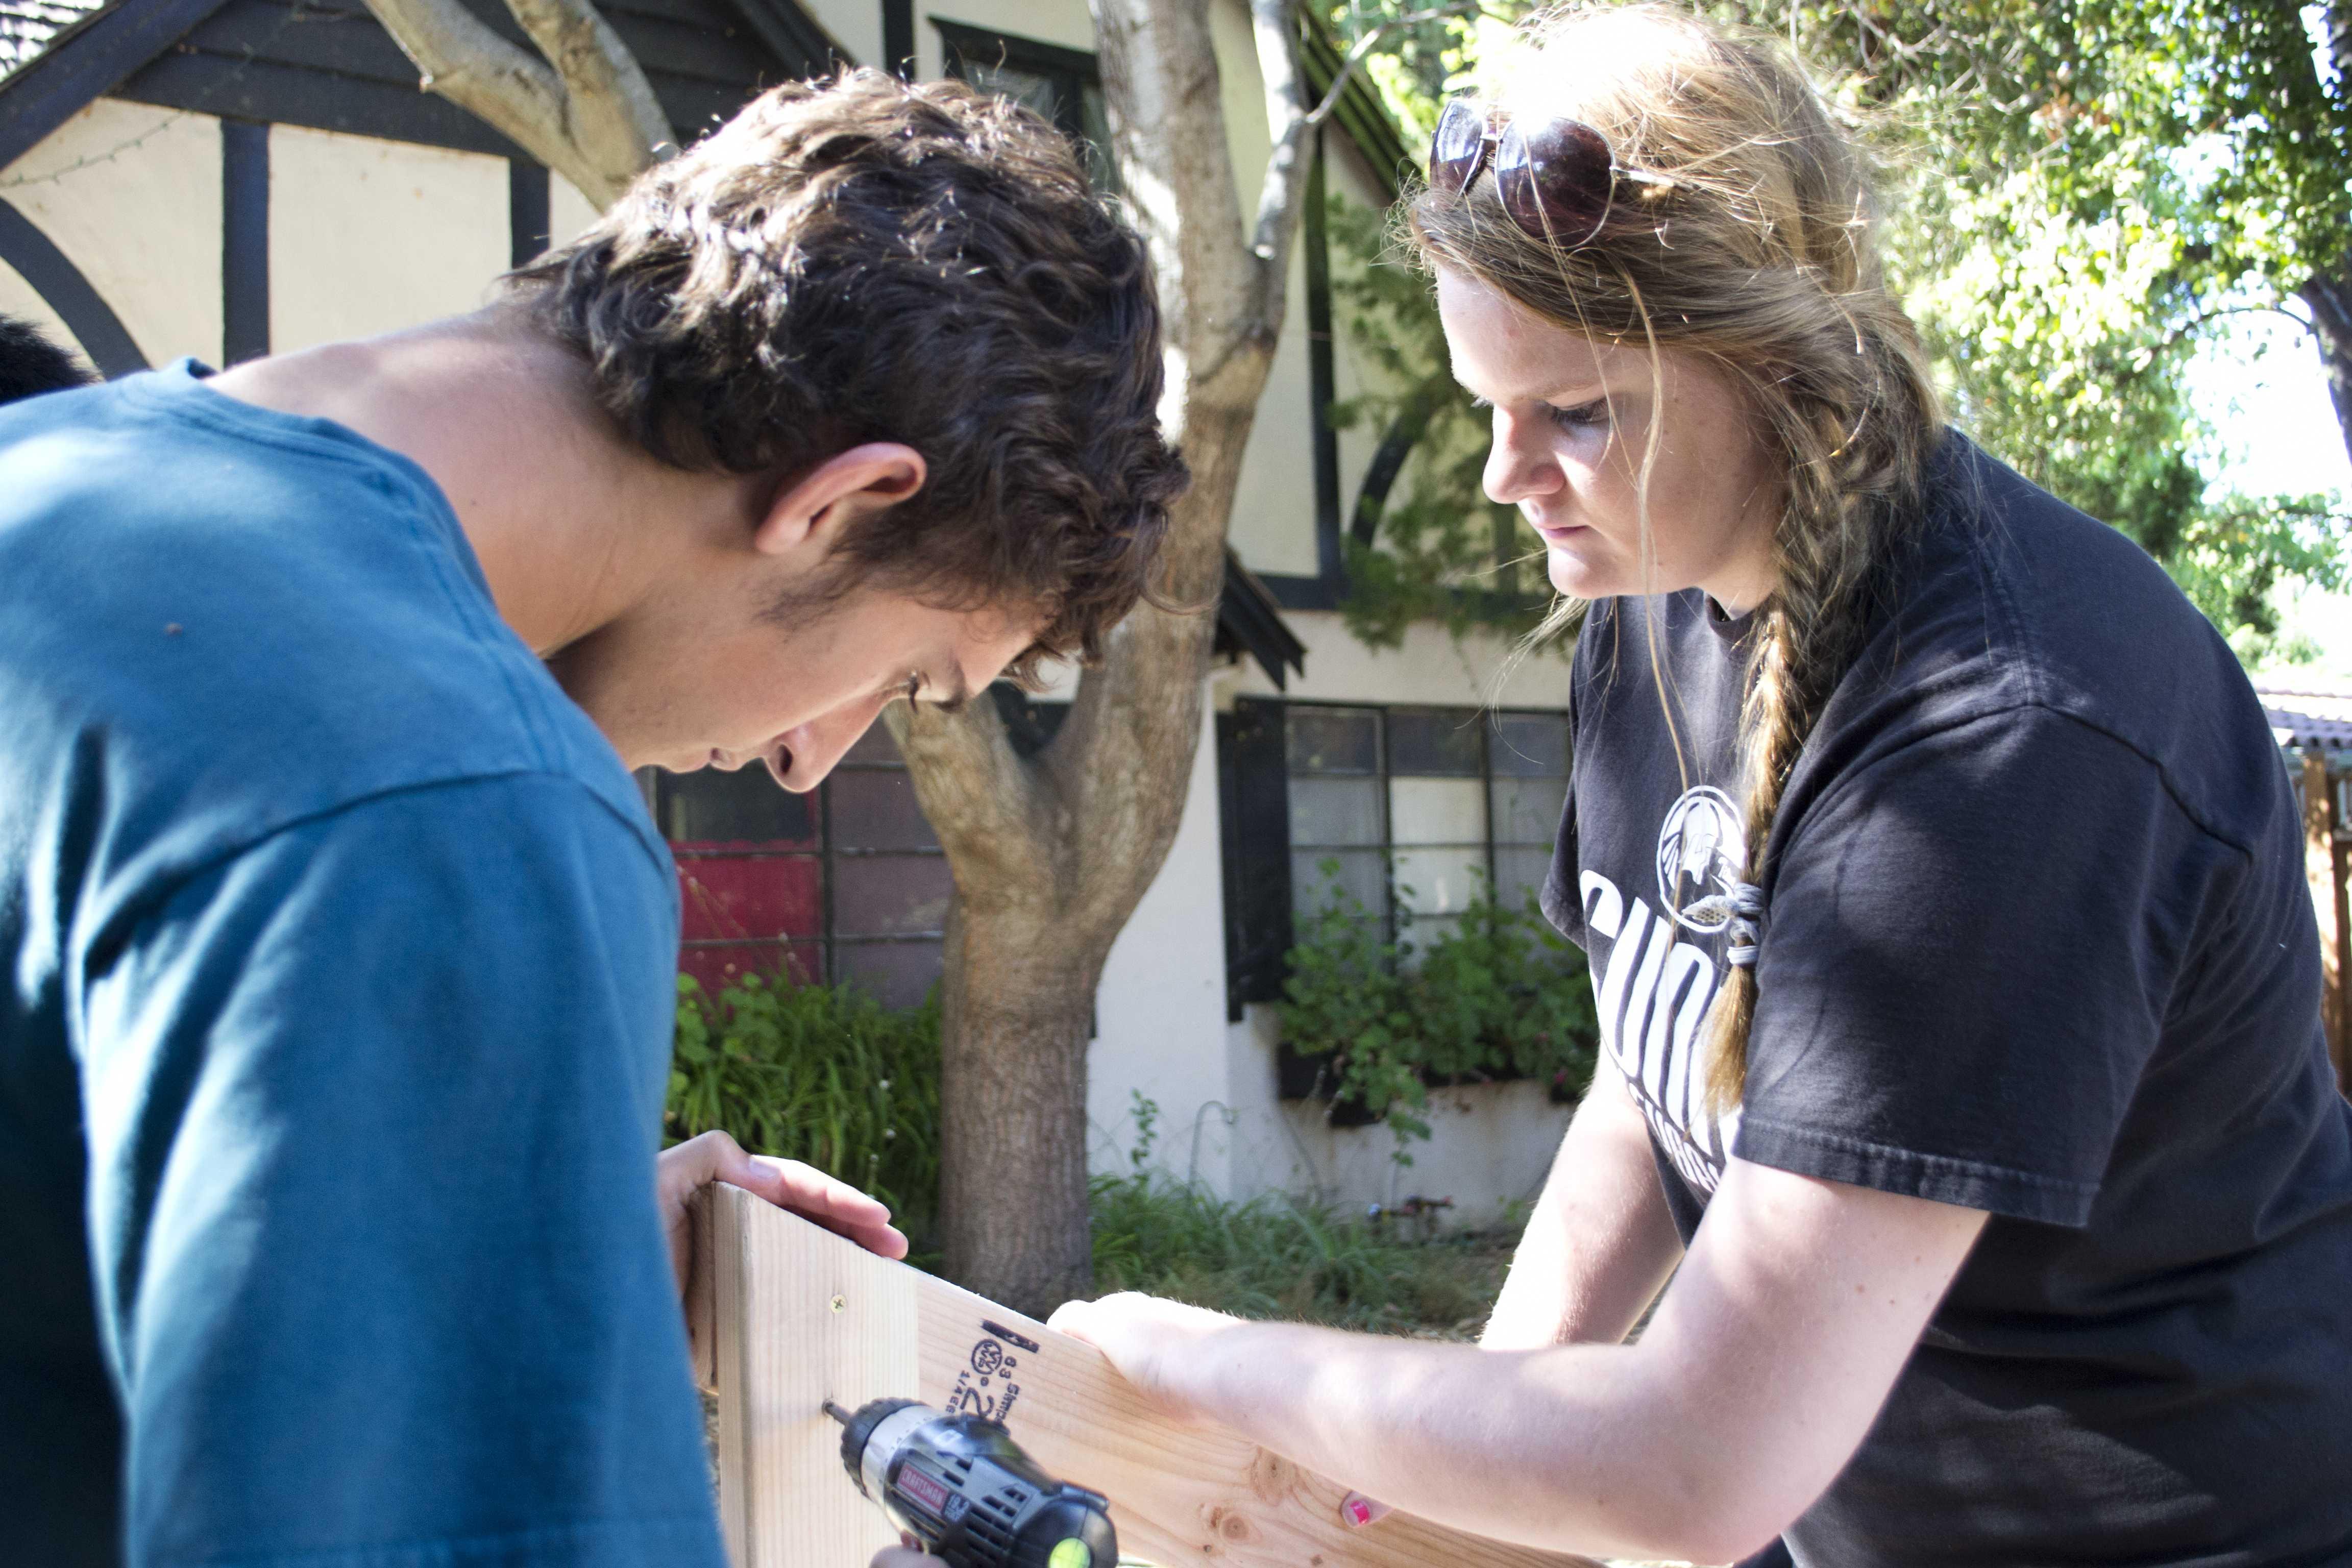 Senior David Stelzer holds wooden planks while senior Schuyler Sun drills them together.